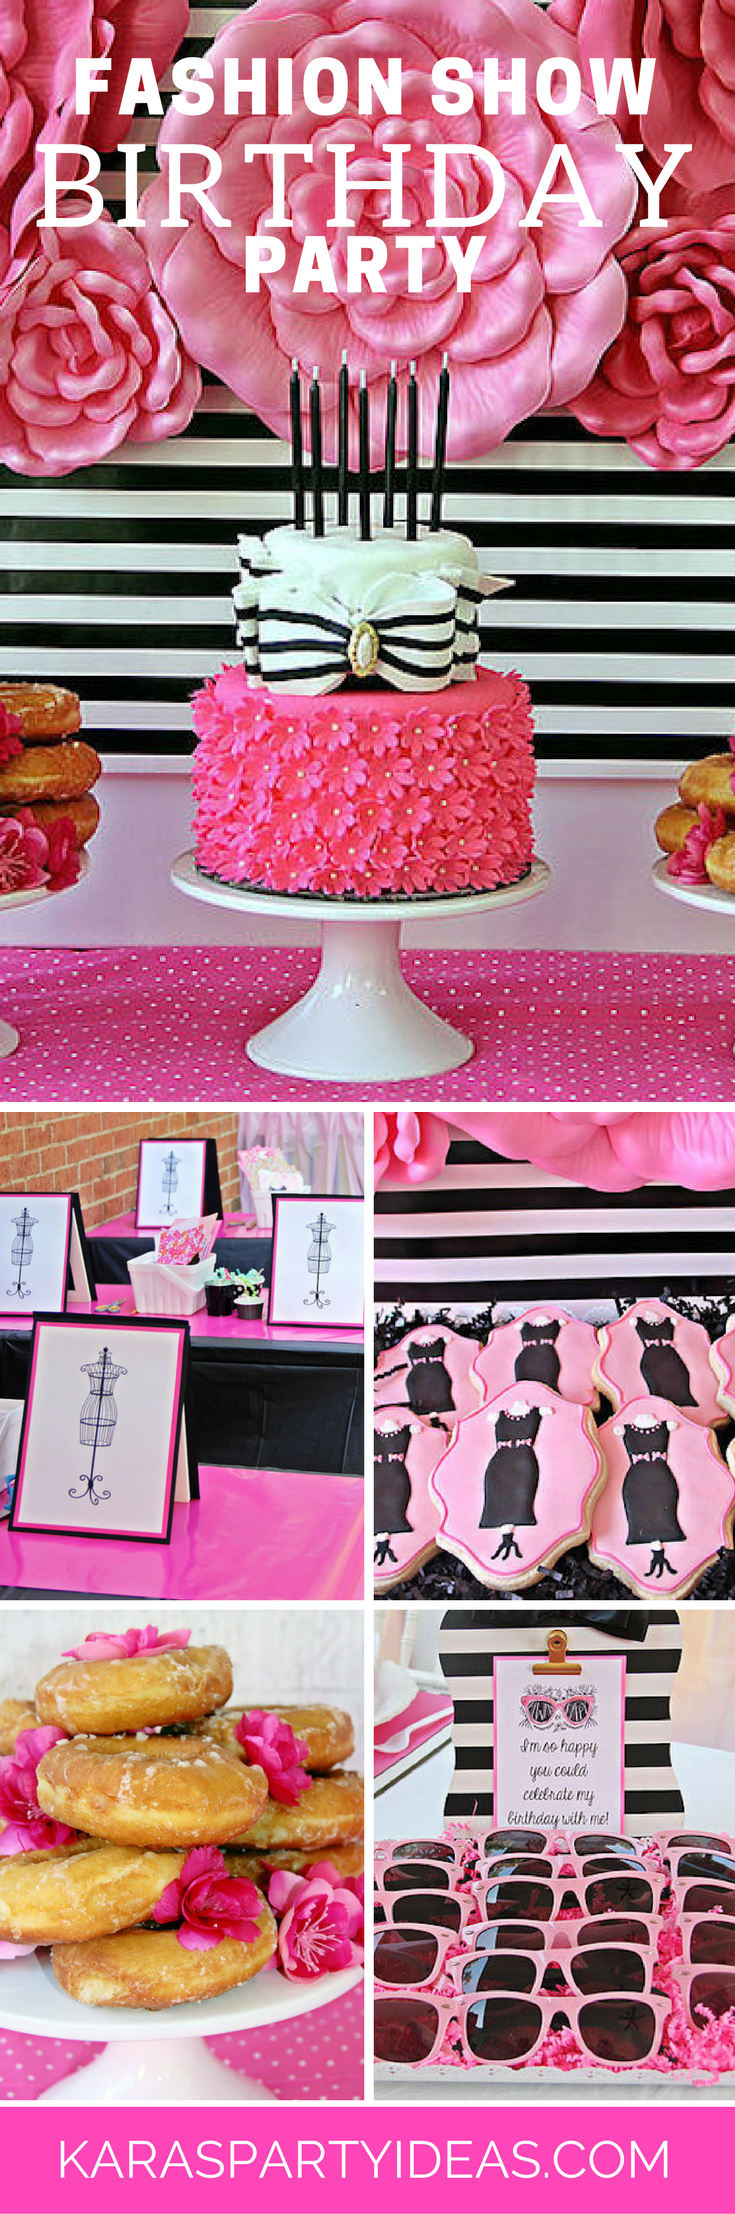 Fashion Show Birthday Party via Kara's Party Ideas - KarasPartyIdeas.com